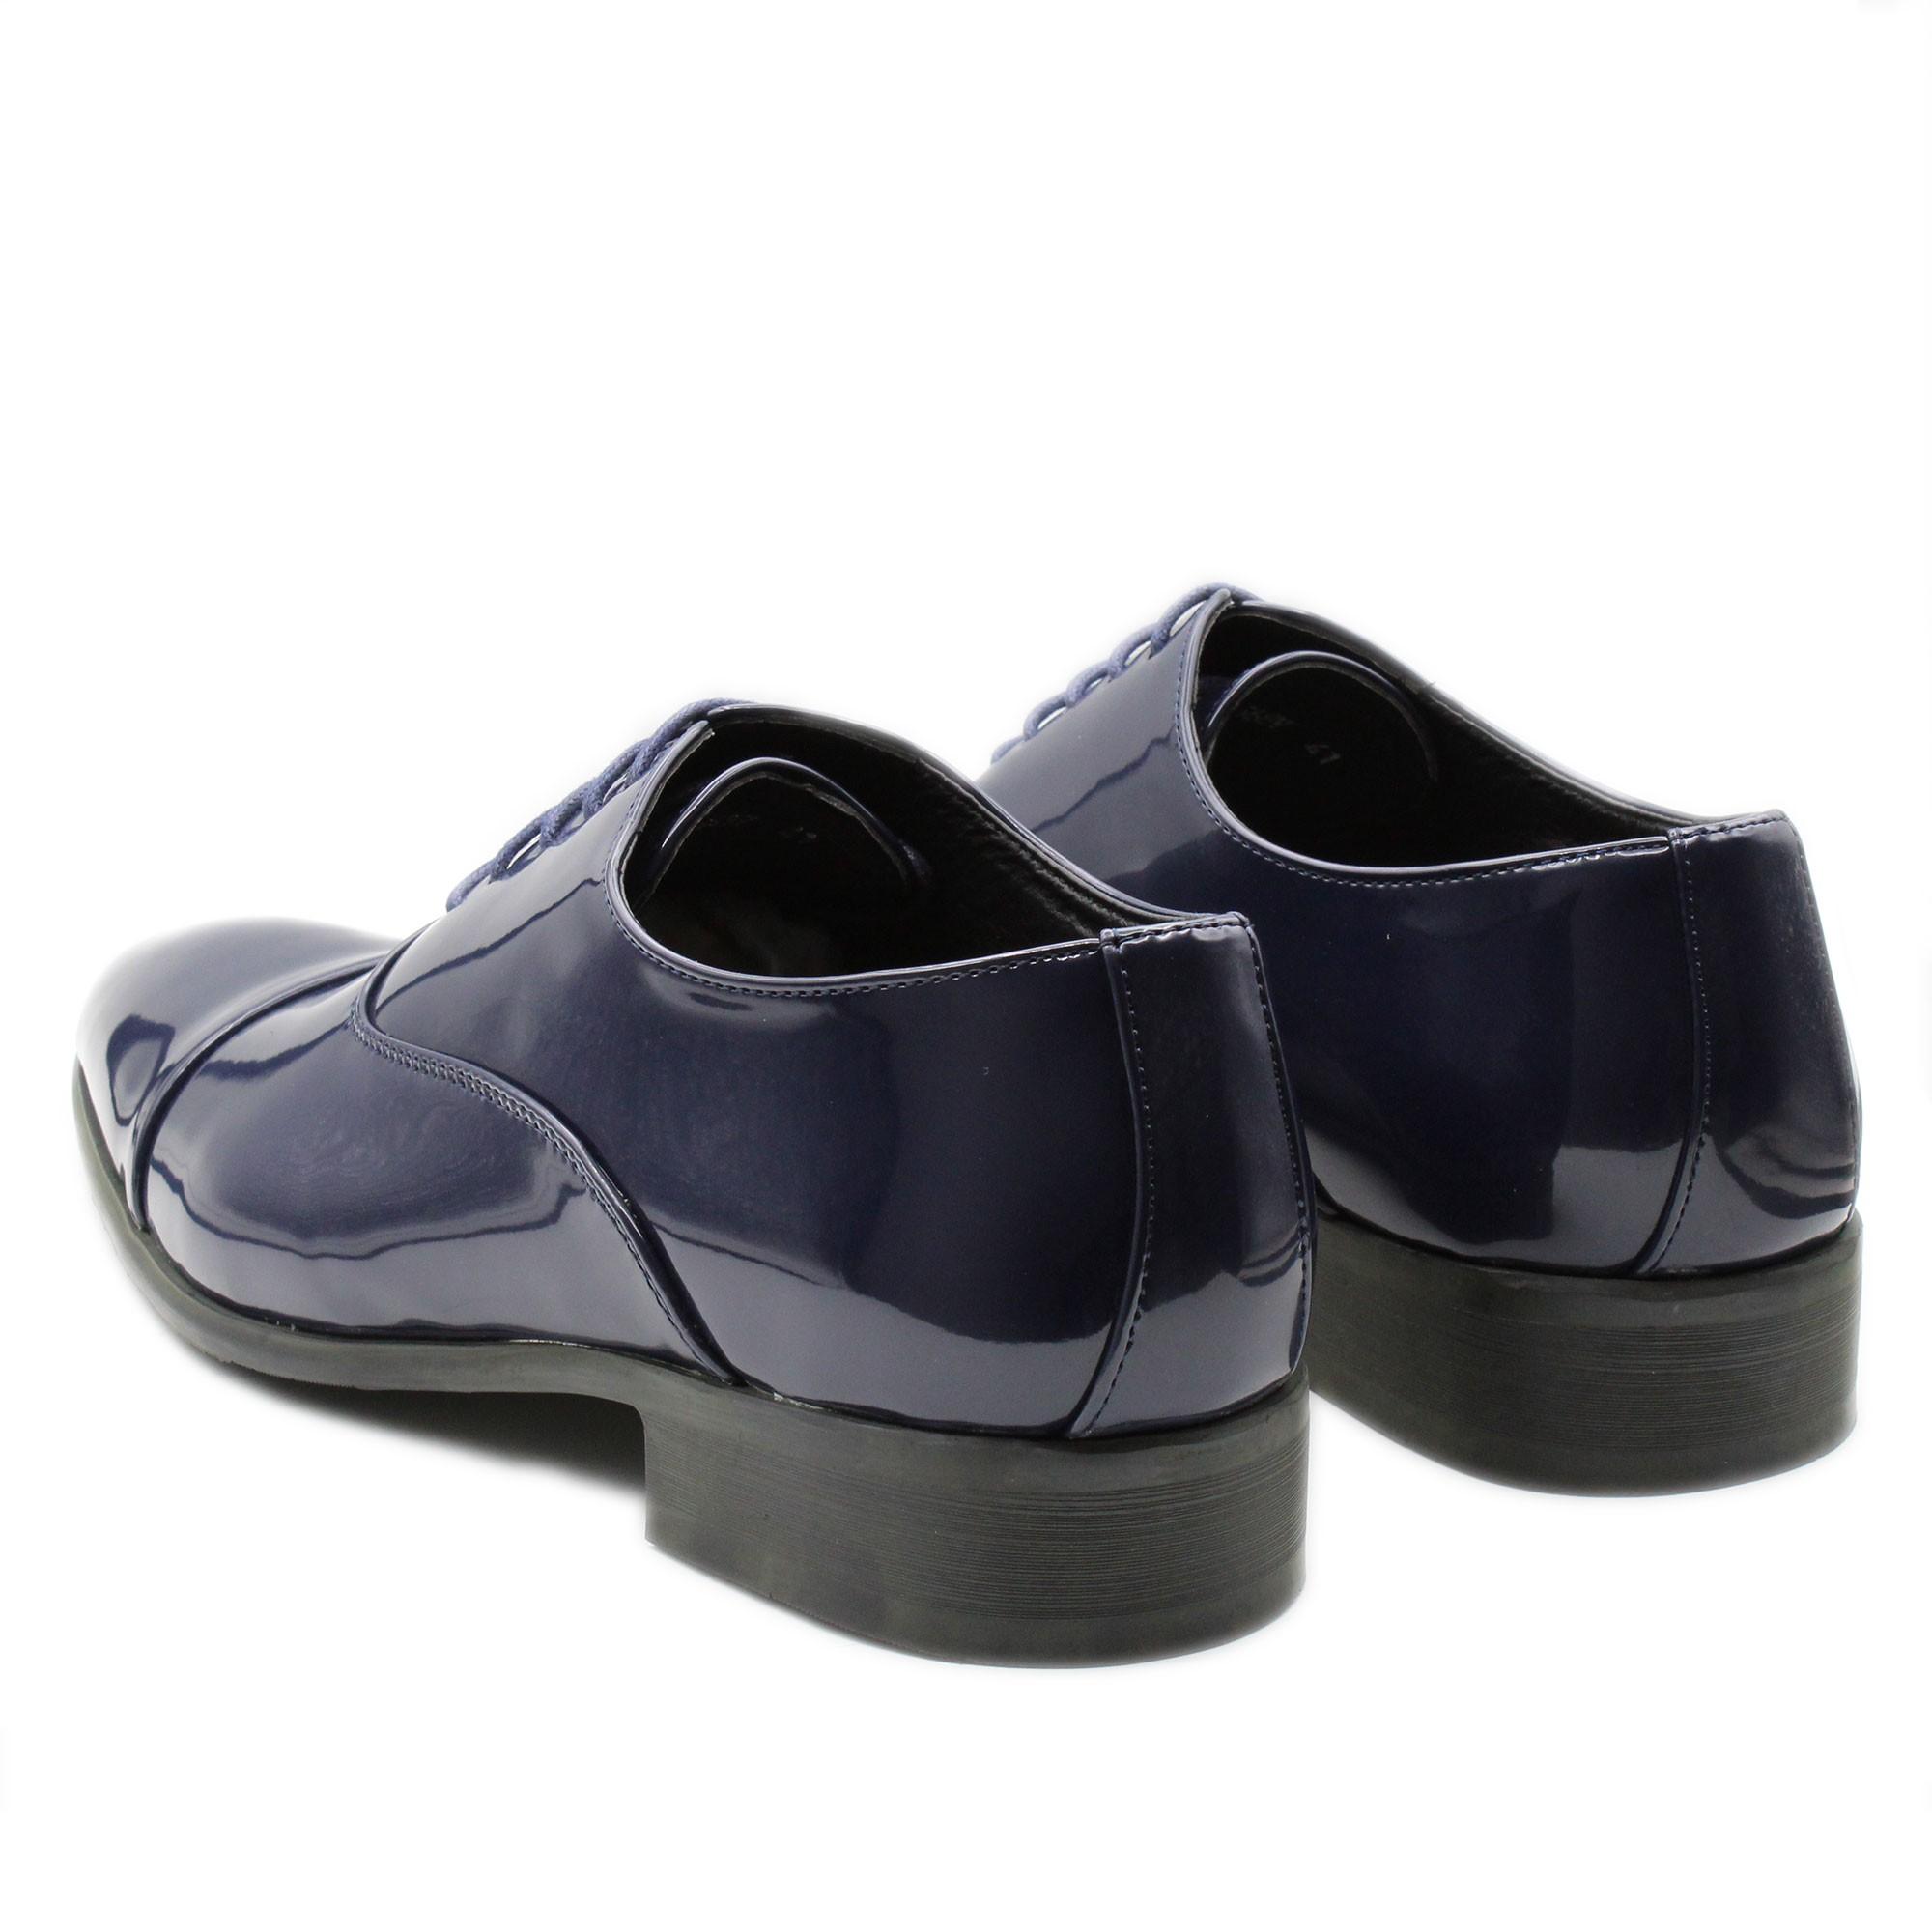 Scarpe-Uomo-Eleganti-Lucide-Blu-Nere-Francesine-Classiche-Cerimonia-Oxford miniatura 6